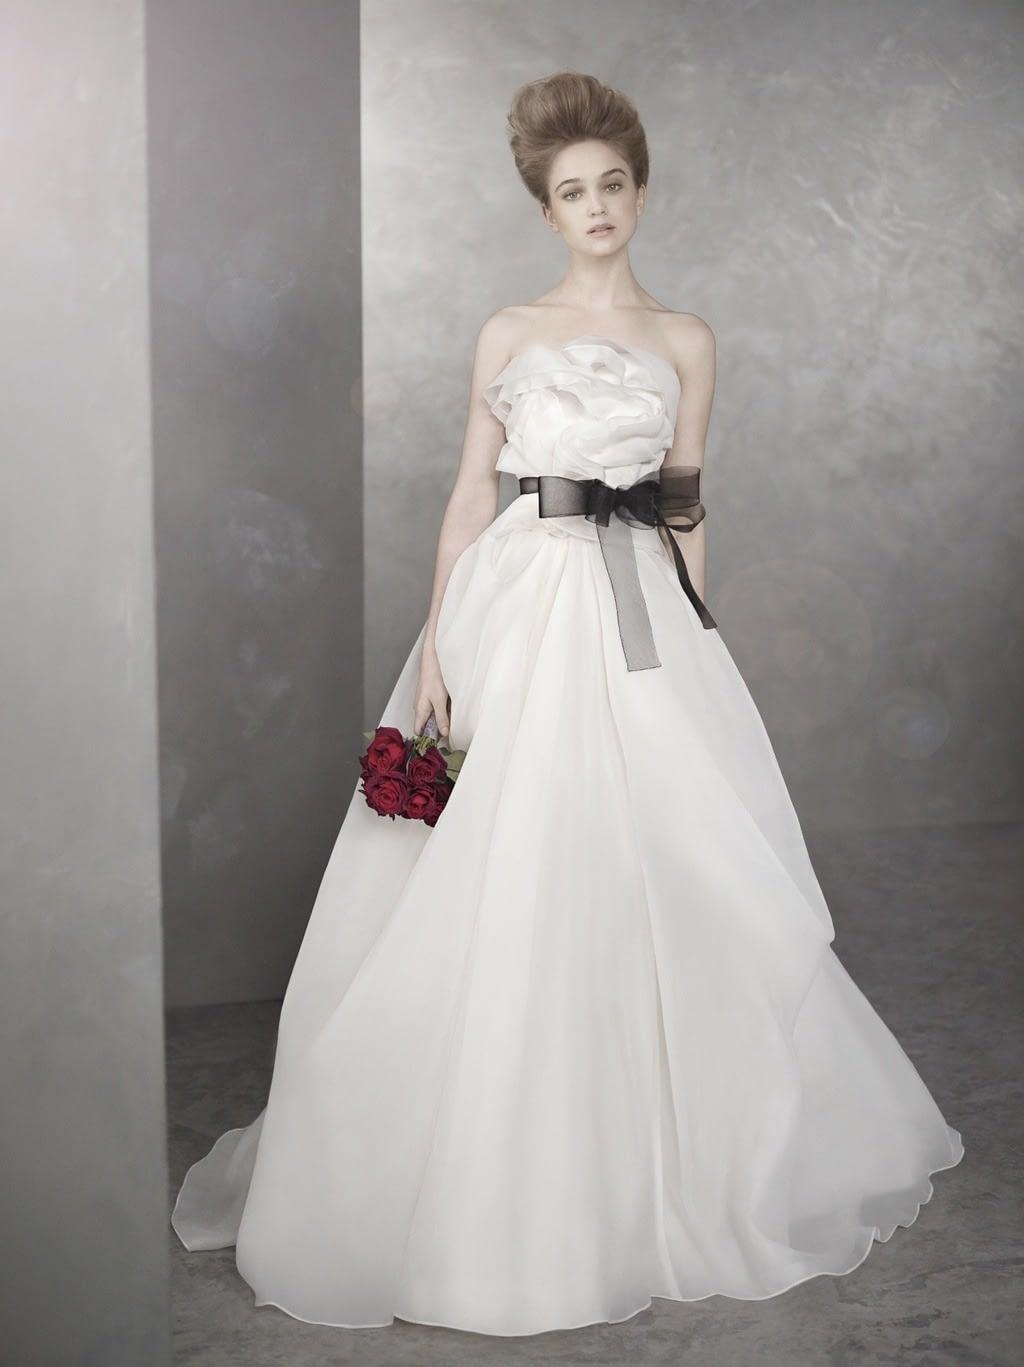 white by vera wang wedding dresses spring  bridal gown romantic a line blacl sash